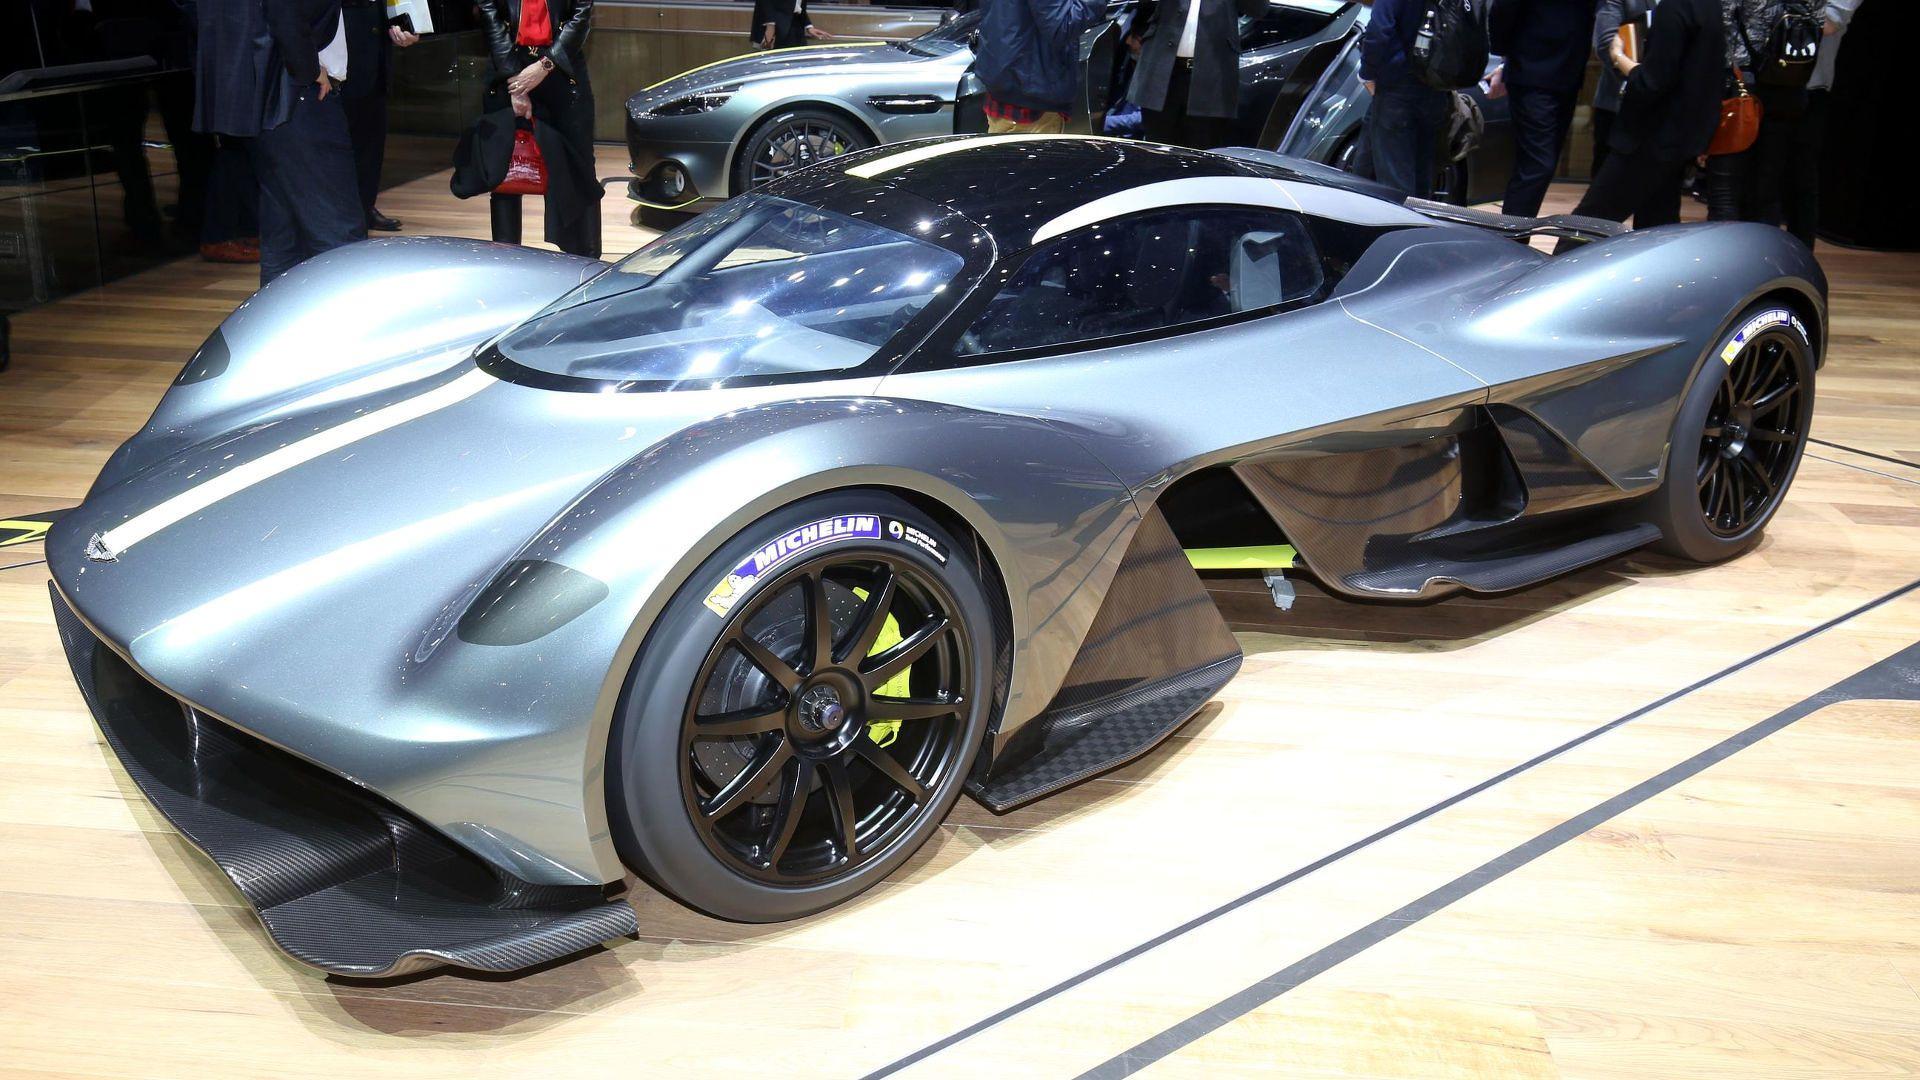 Aston Martin Am Rb 001 Will Rock A Cosworth 6 5 Liter V12 Engine